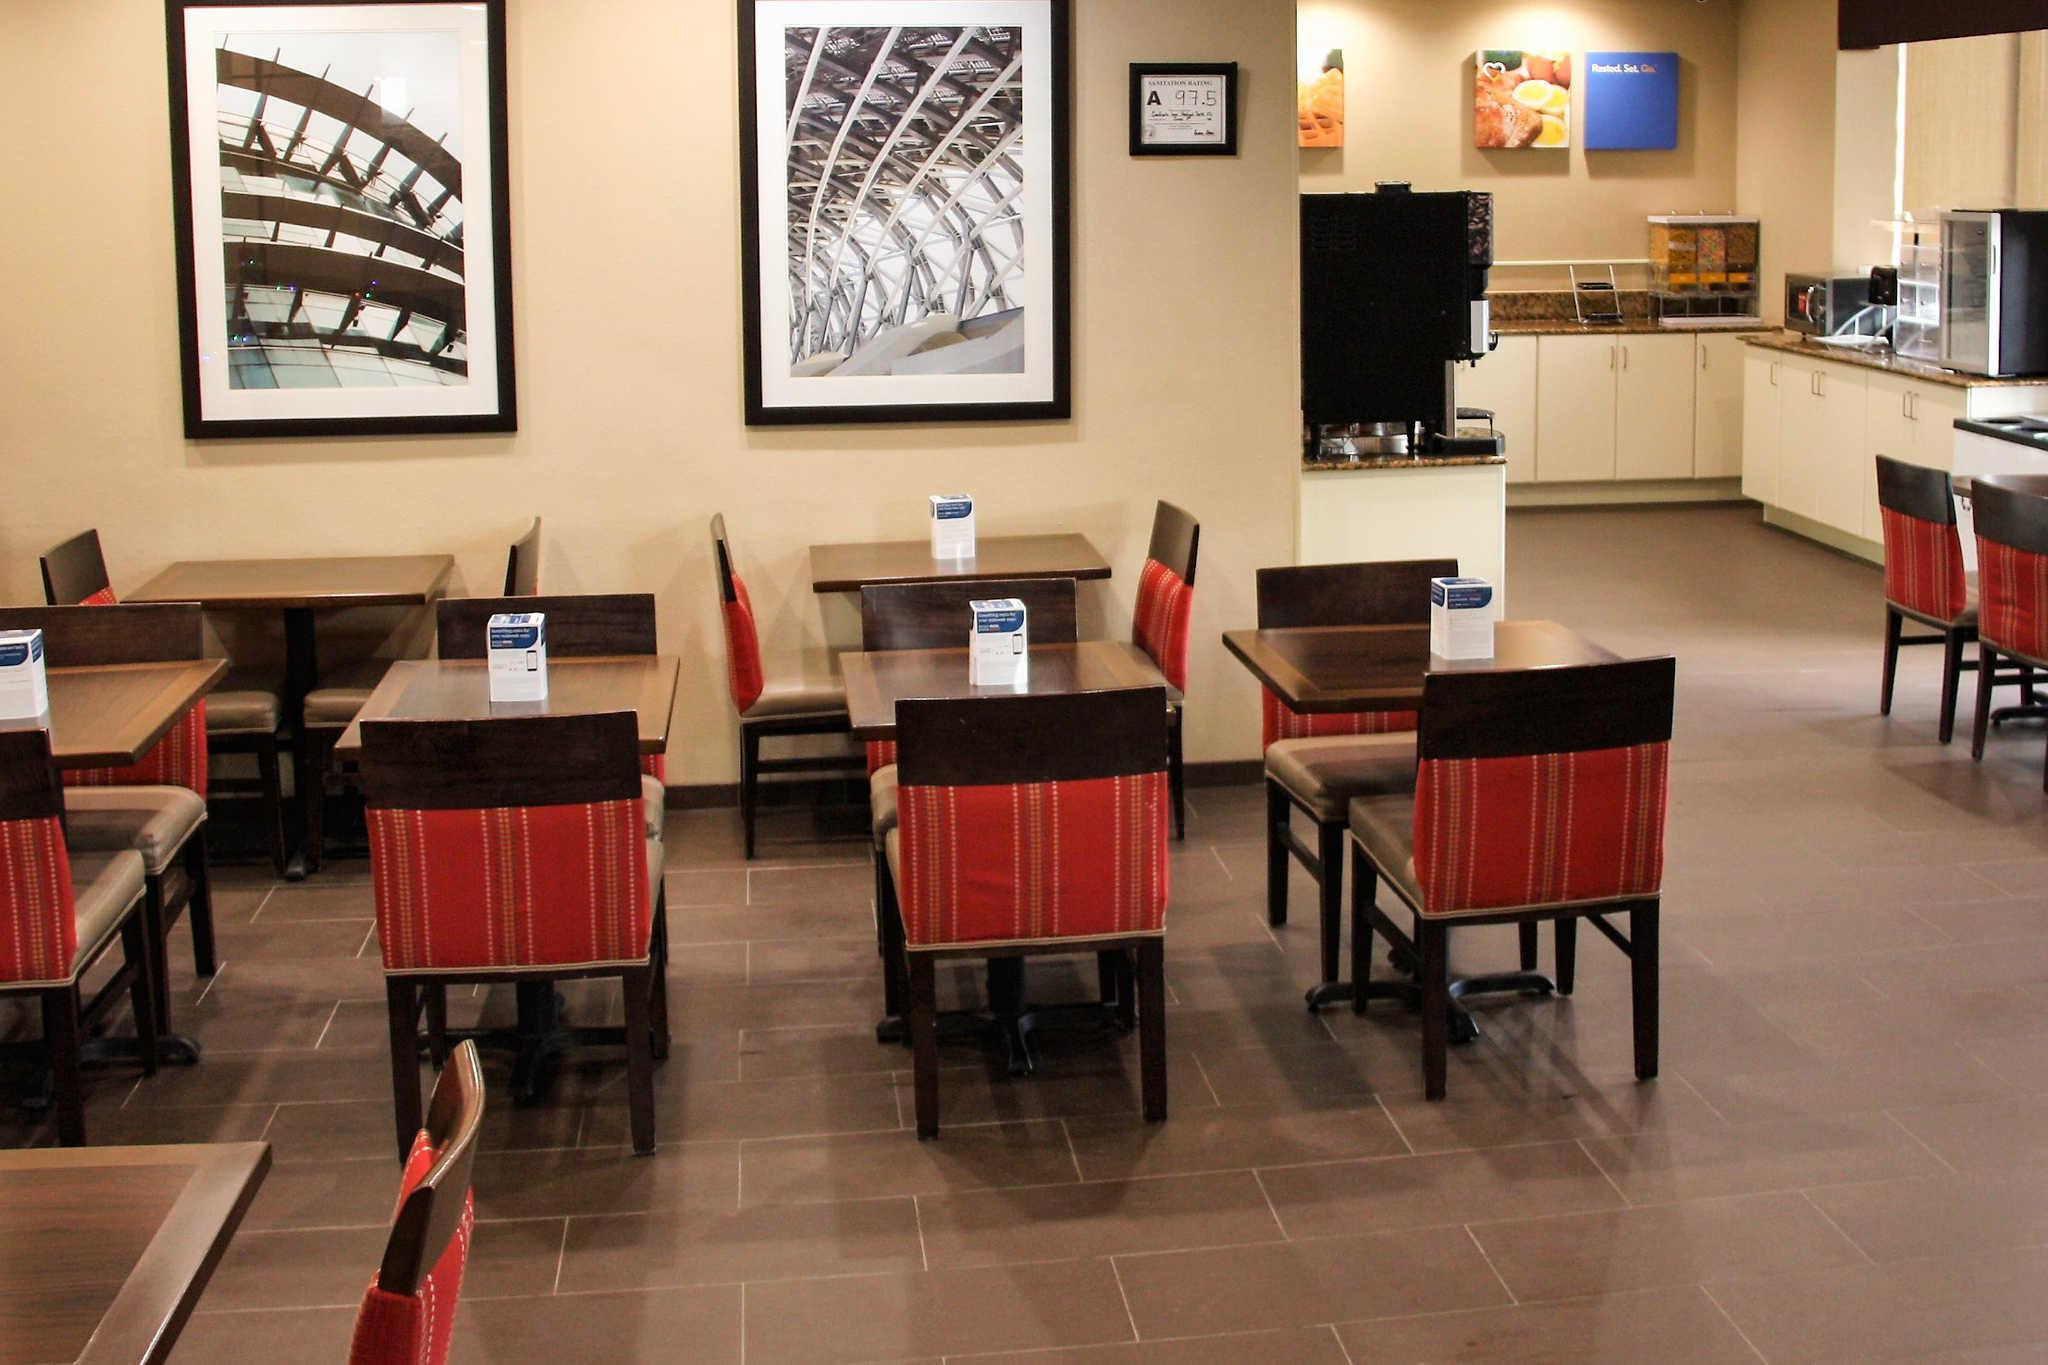 Comfort Inn & Suites Duke University-Downtown image 26